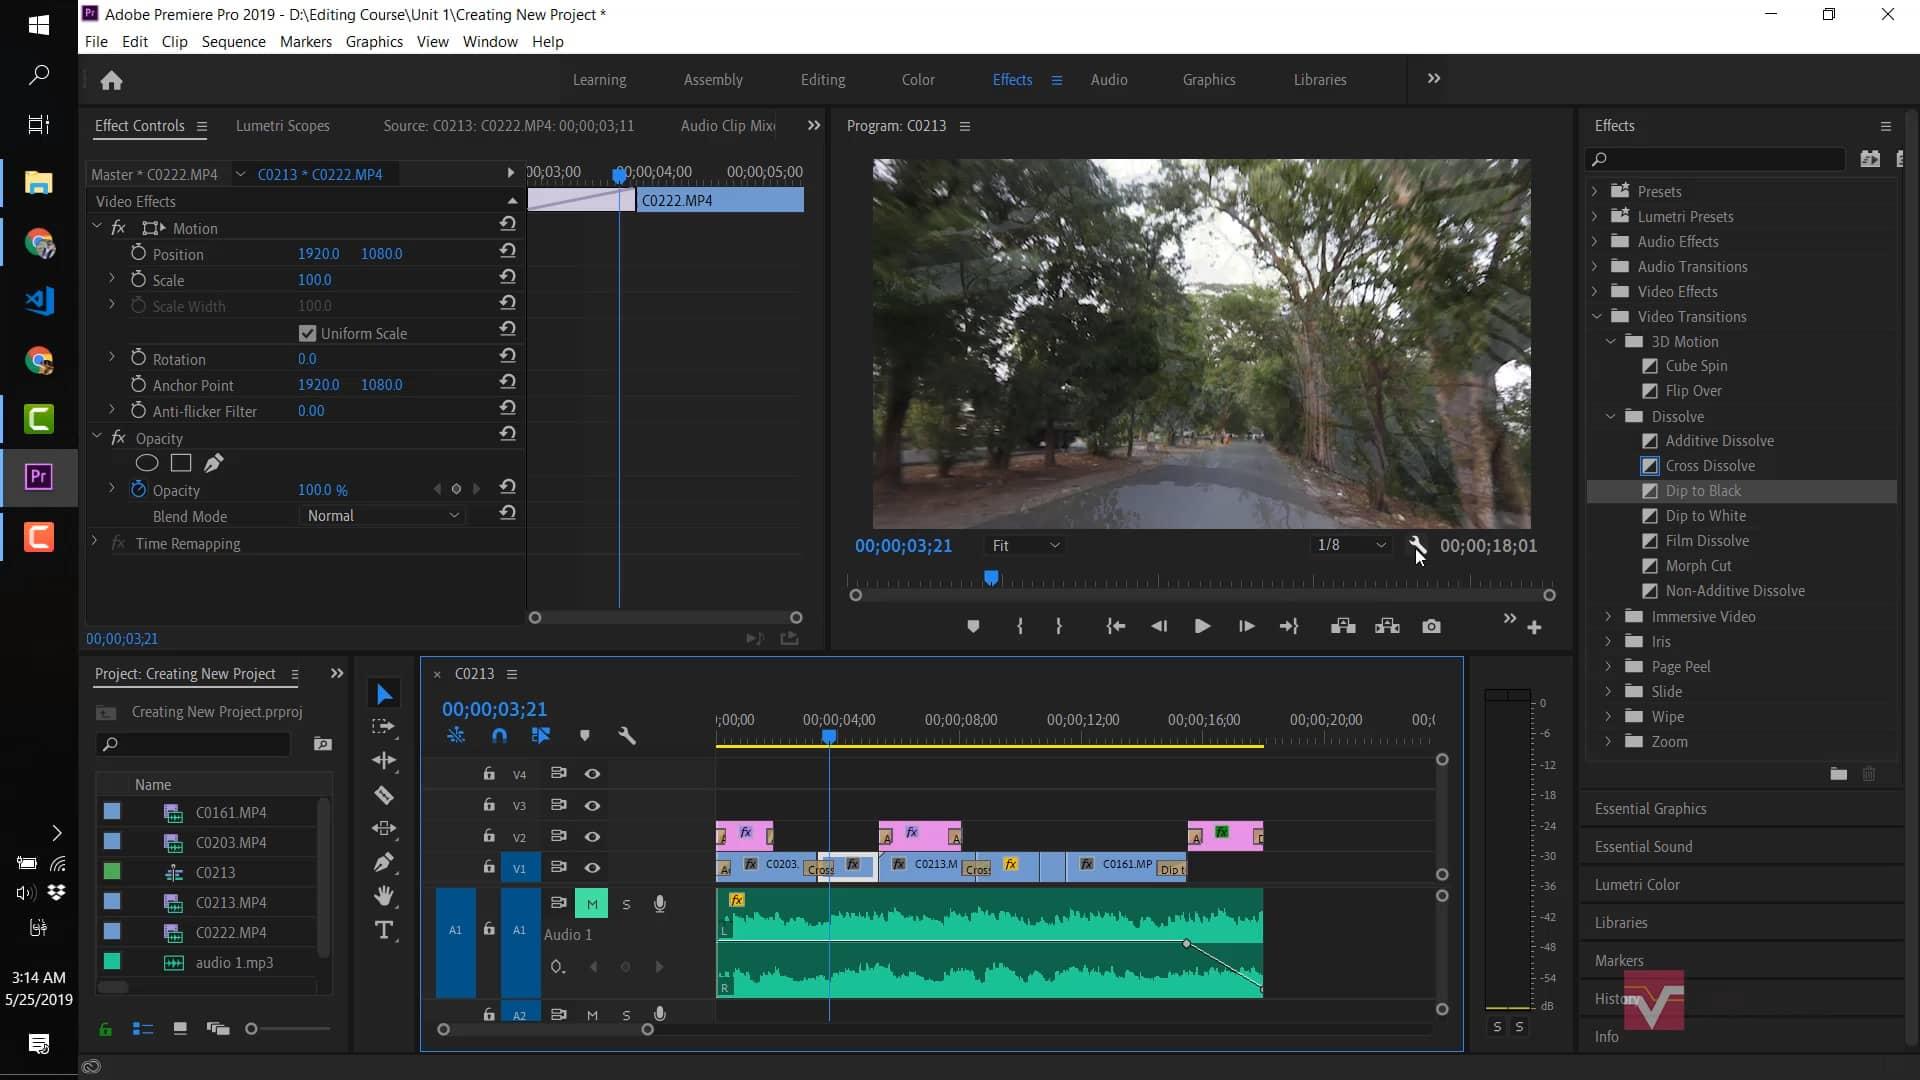 ၃.၁ Stabilize Video Effect အသုံးပြုခြင်း